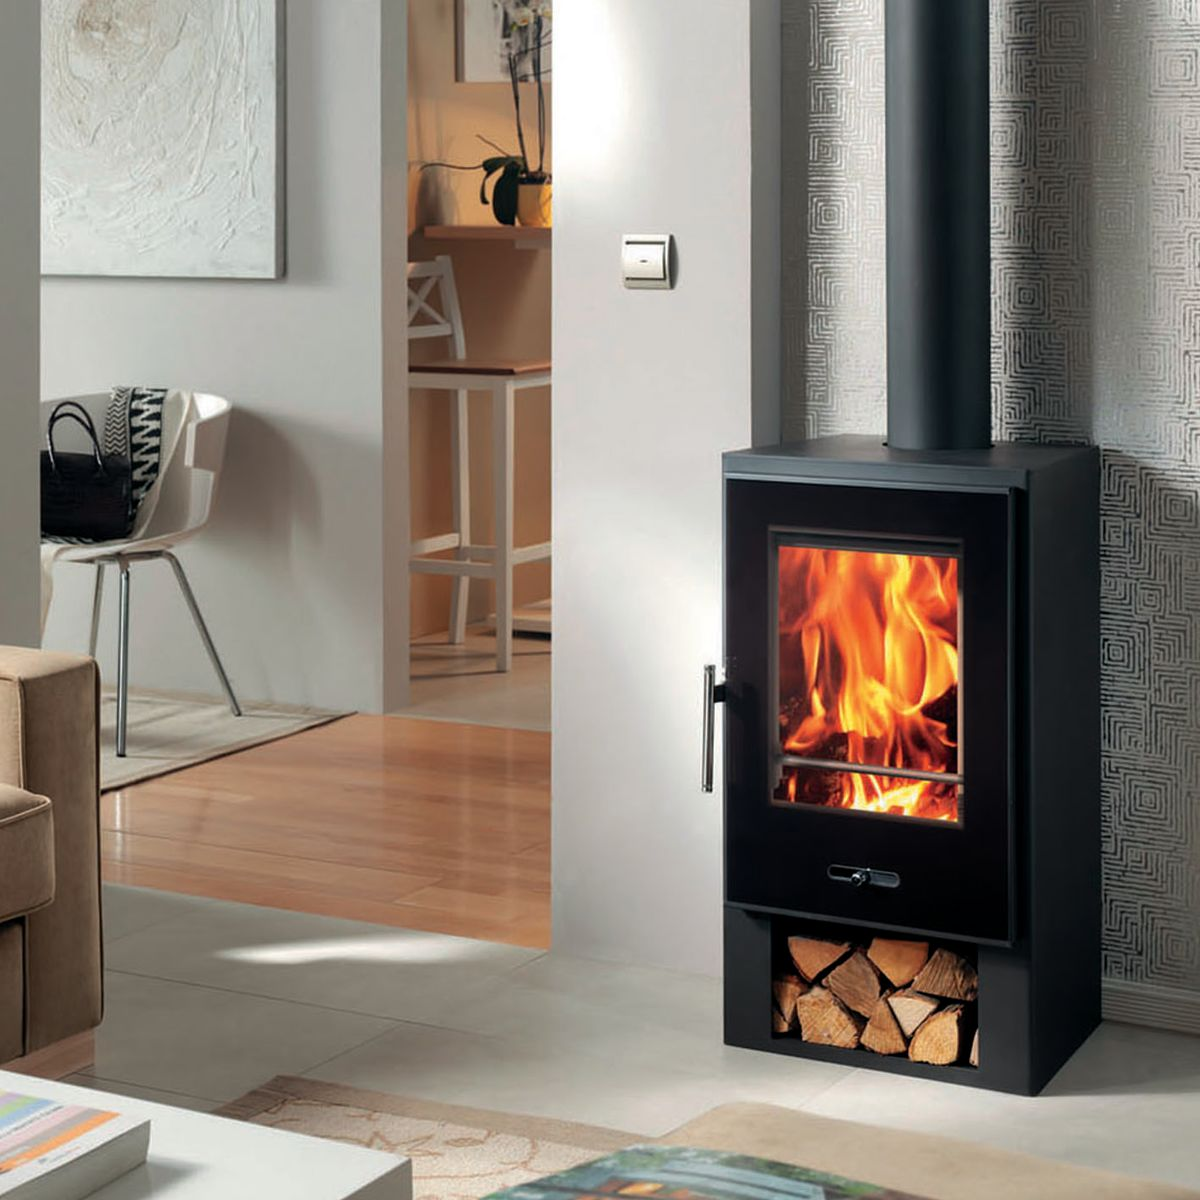 Stunning Stufa A Legna Economica Ideas - Home Design Ideas 2017 ...